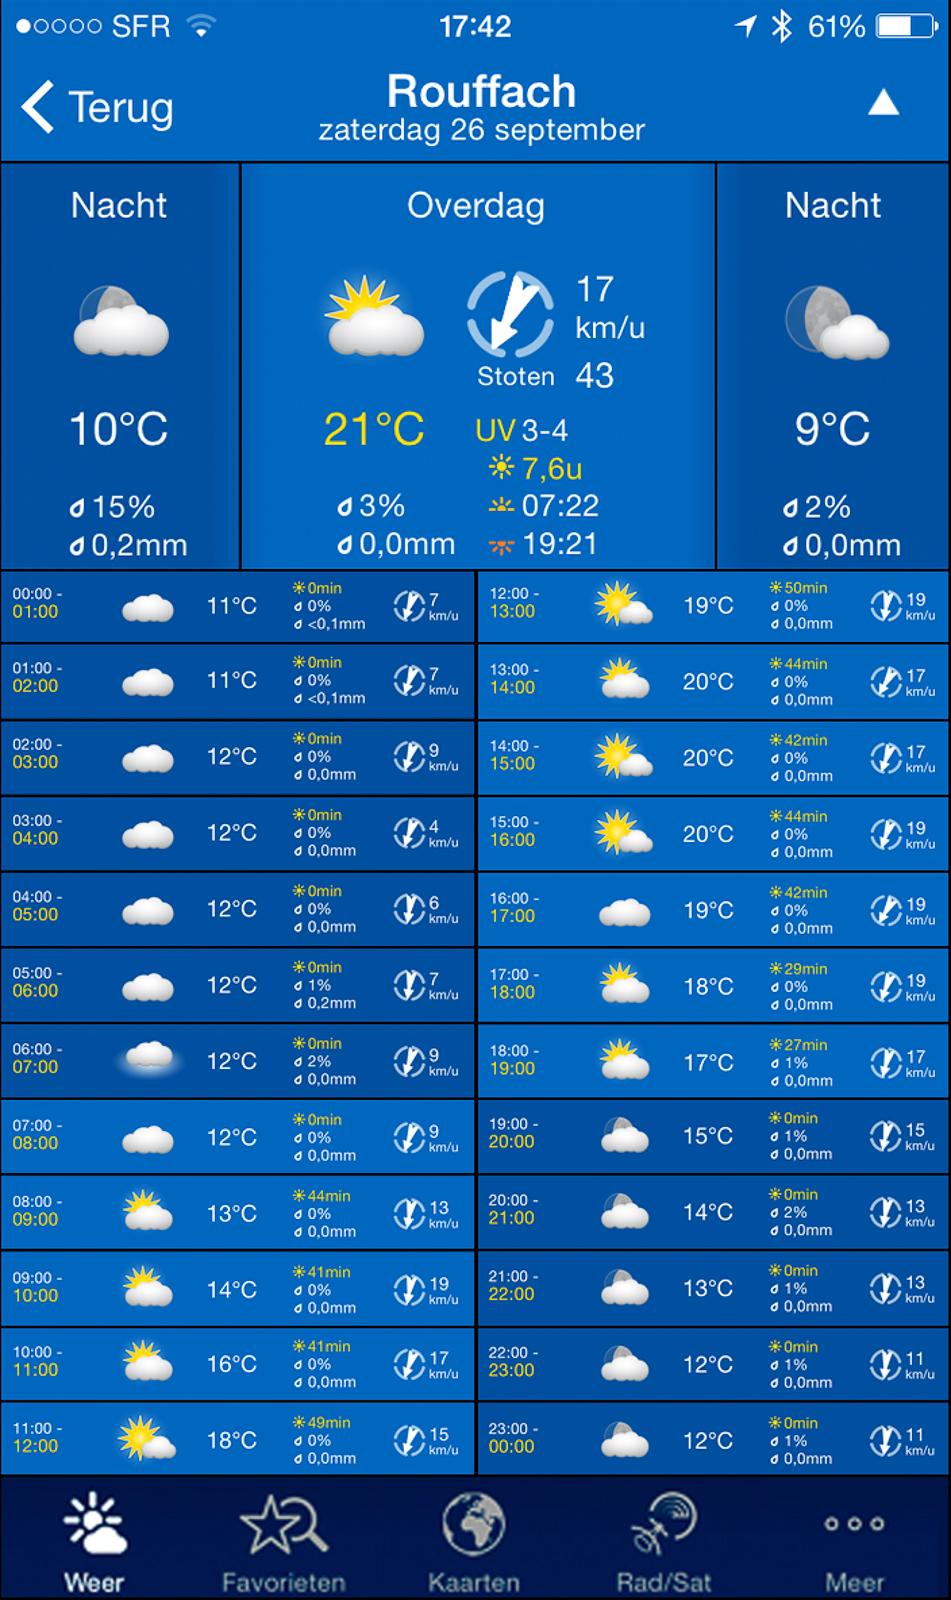 Dag02-Alsace-001-Weersvoorspelling